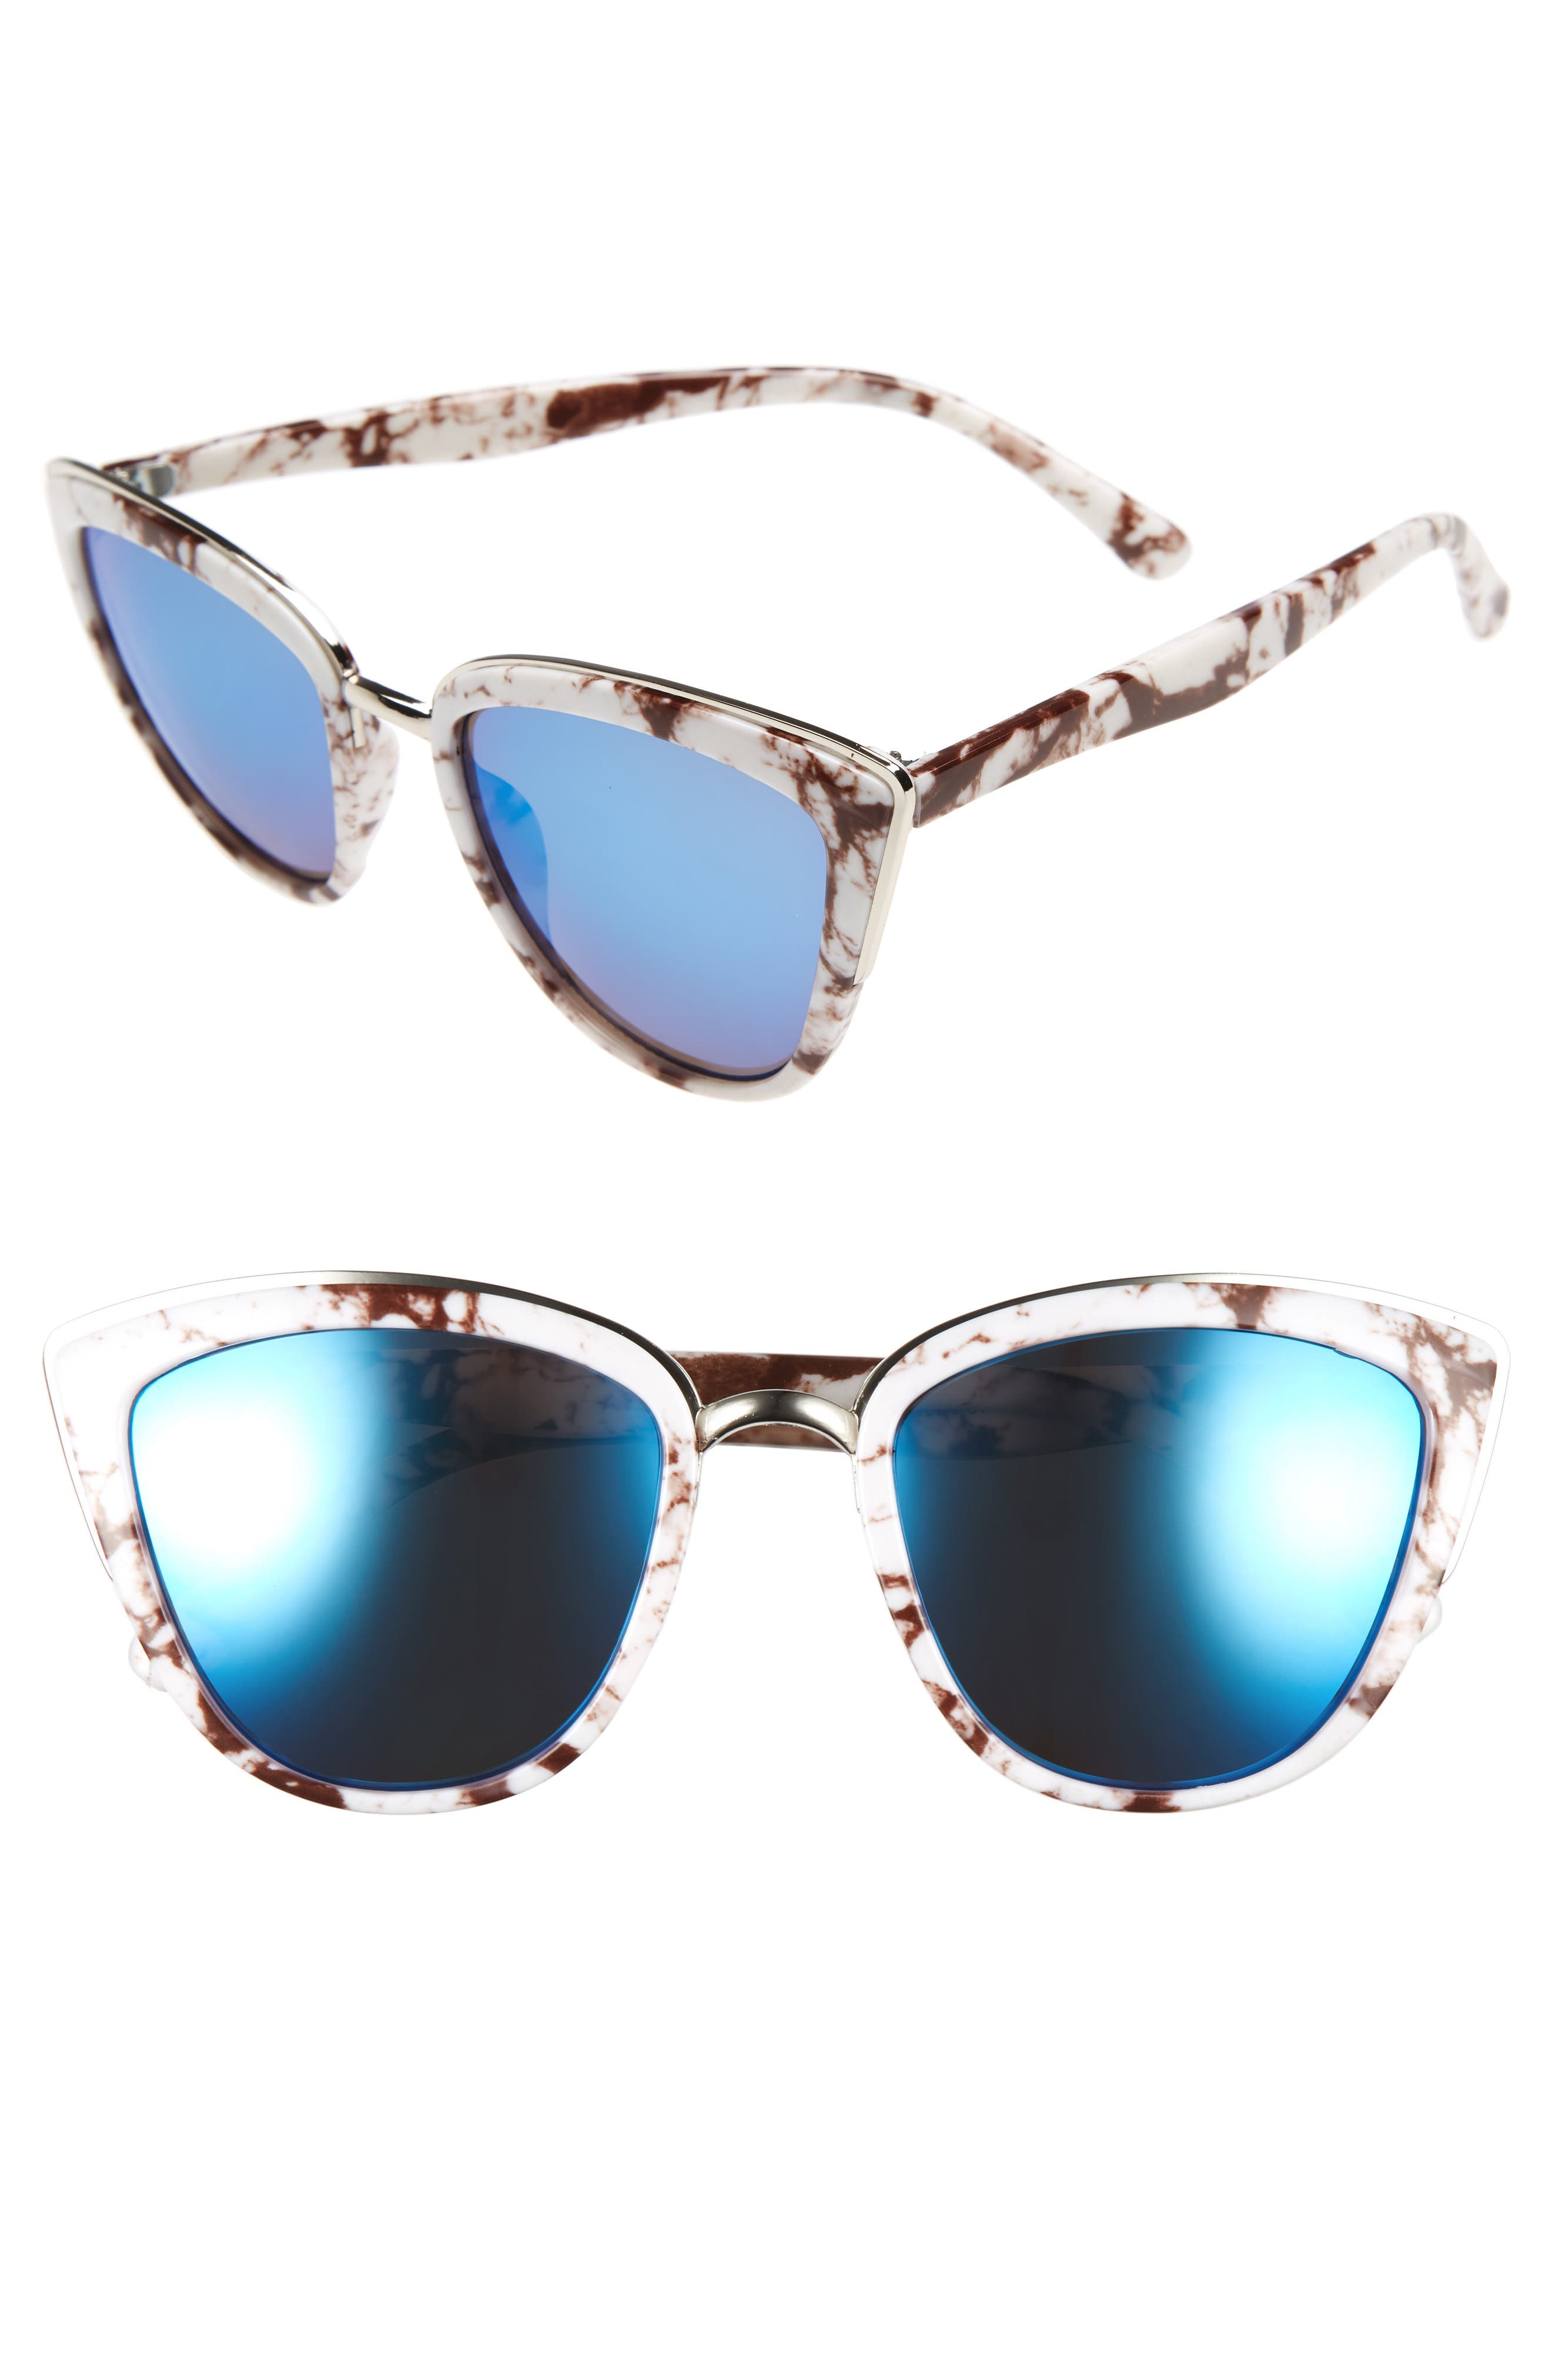 57mm Cat Eye Sunglasses,                         Main,                         color, 100